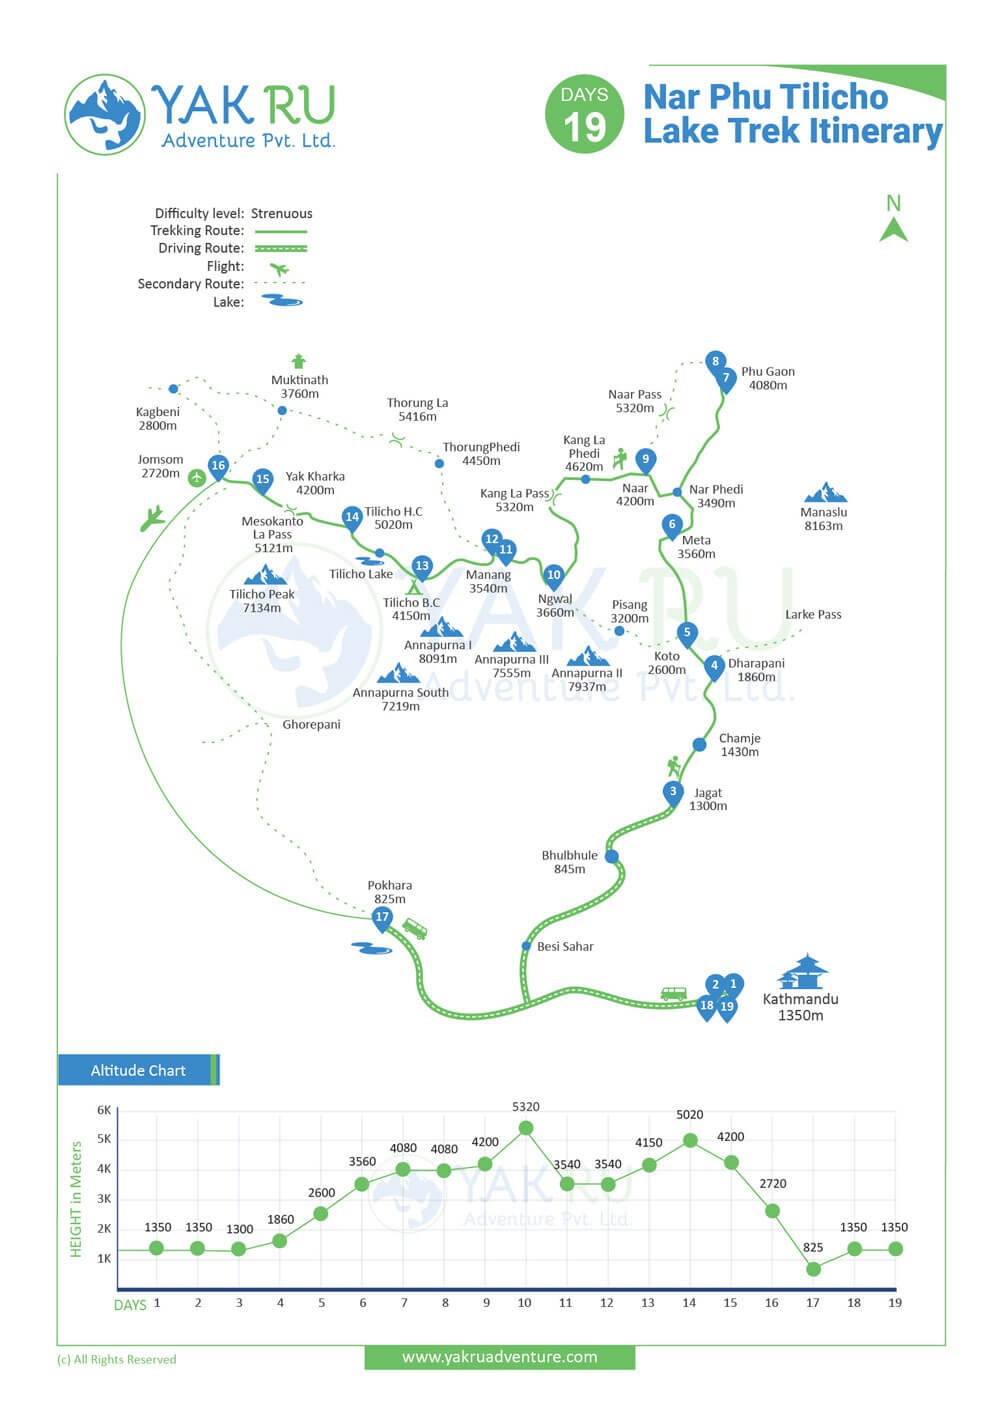 Nar Phu Tilicho Lake Trek map